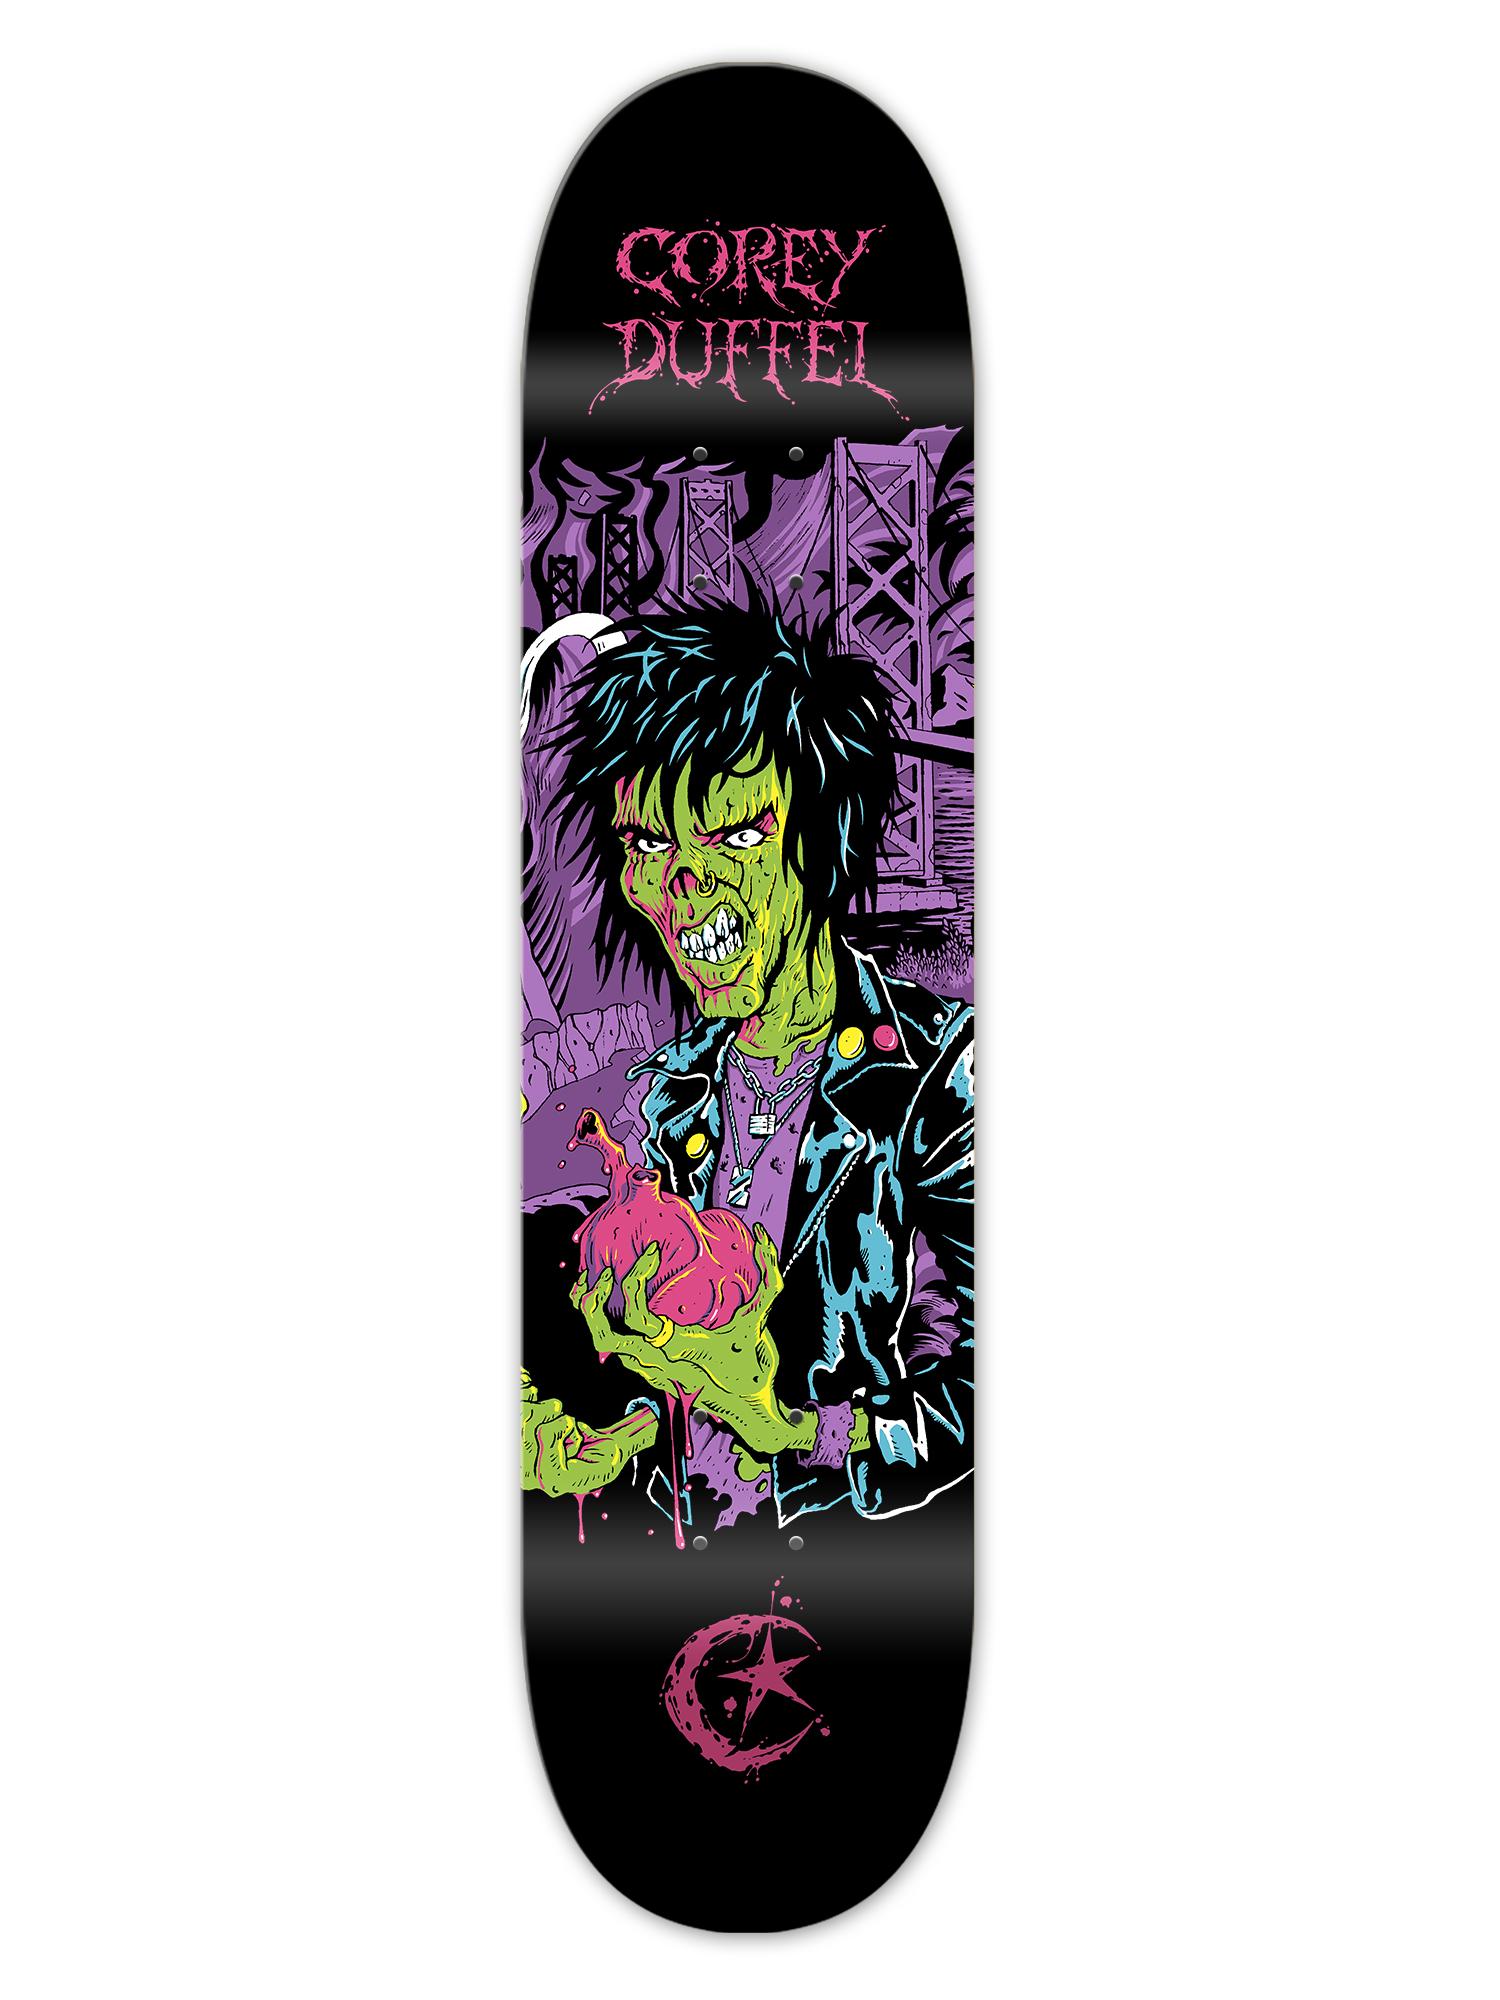 Duffel_Zombie_Deck_skinny.jpg